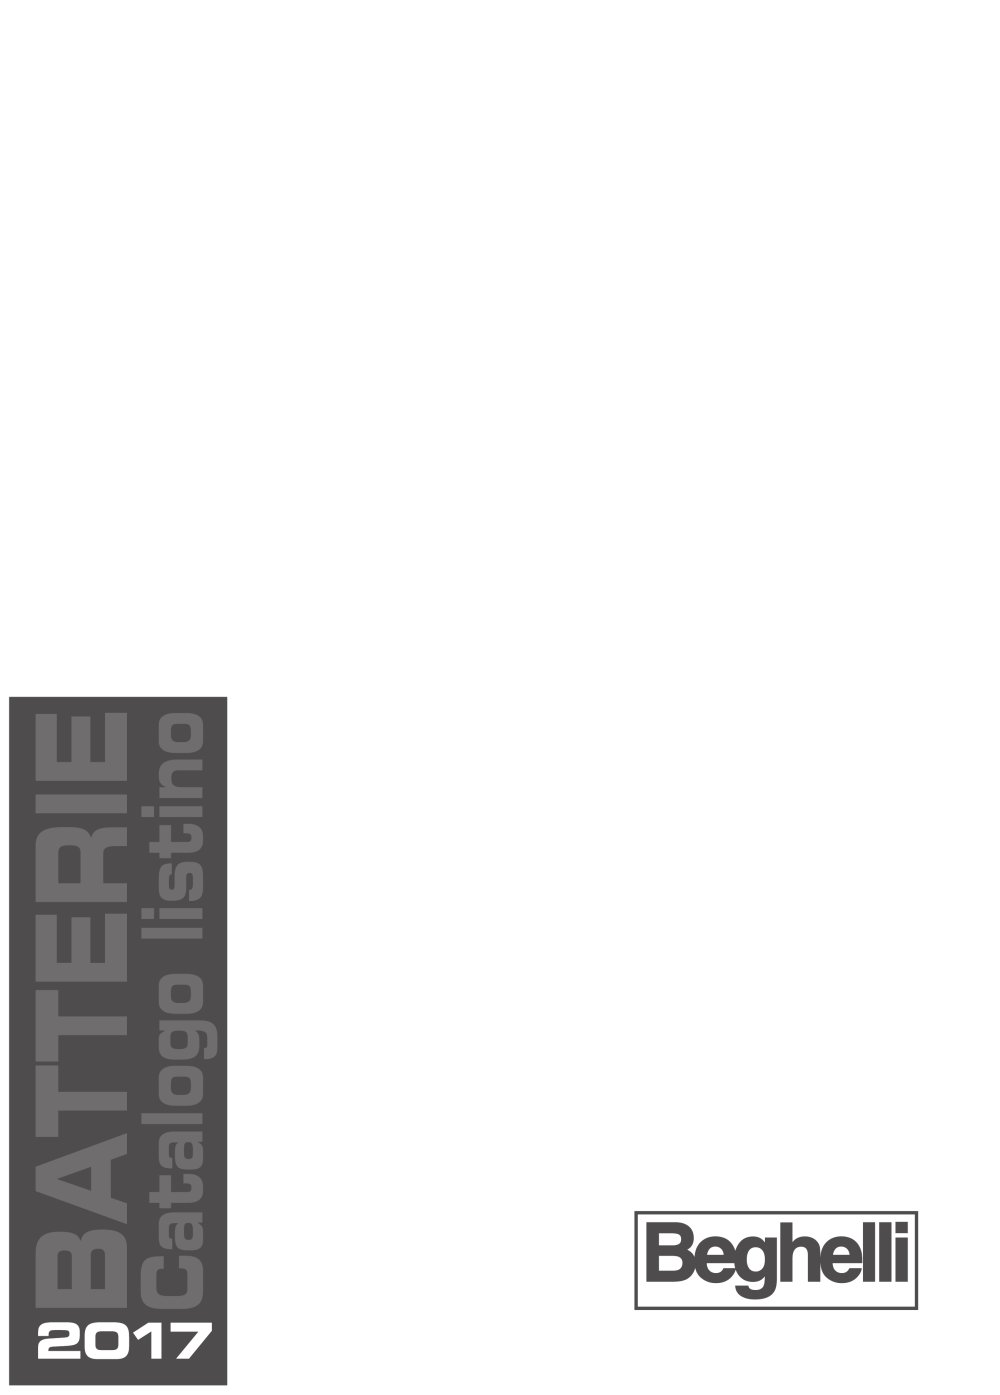 Catalogo Beghelli Lampade Di Emergenza.Batterie Beghelli Catalogo Pdf Documentazione Brochure